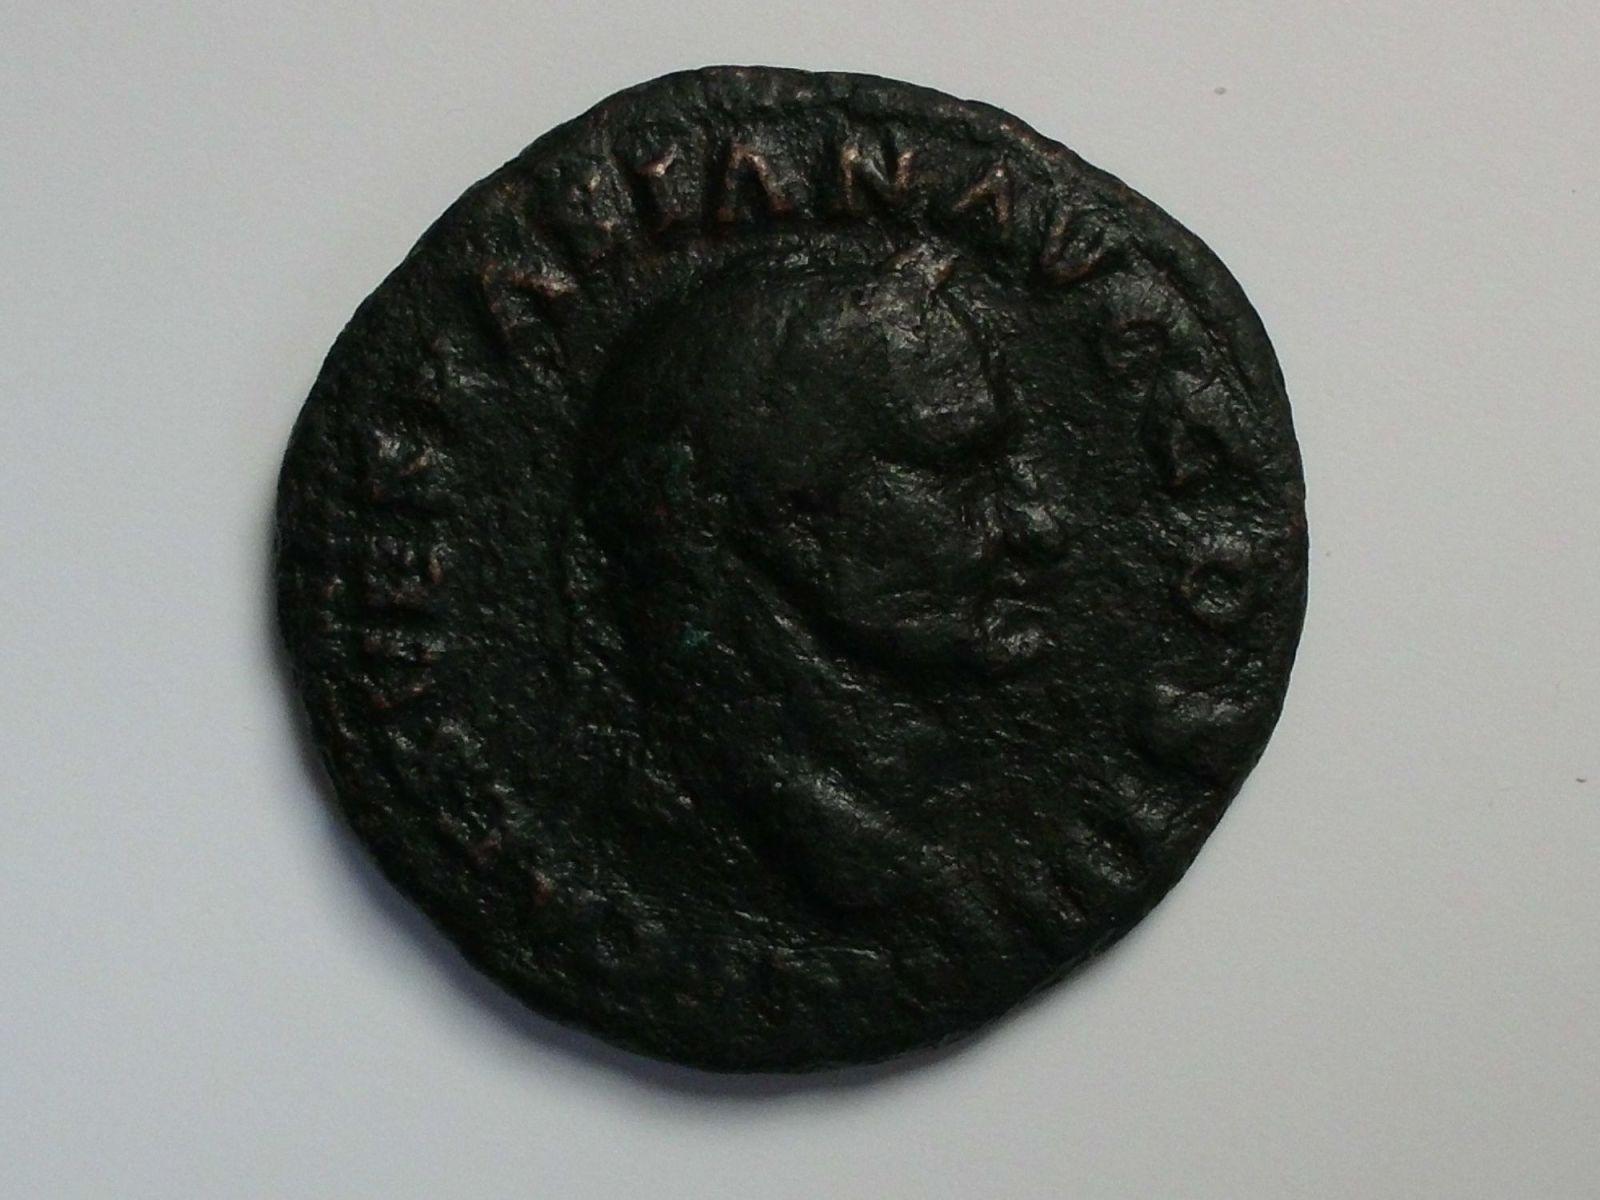 As de Vespasiano. S C - PROVIDENT. Altar. Ceca Roma. 1196sug